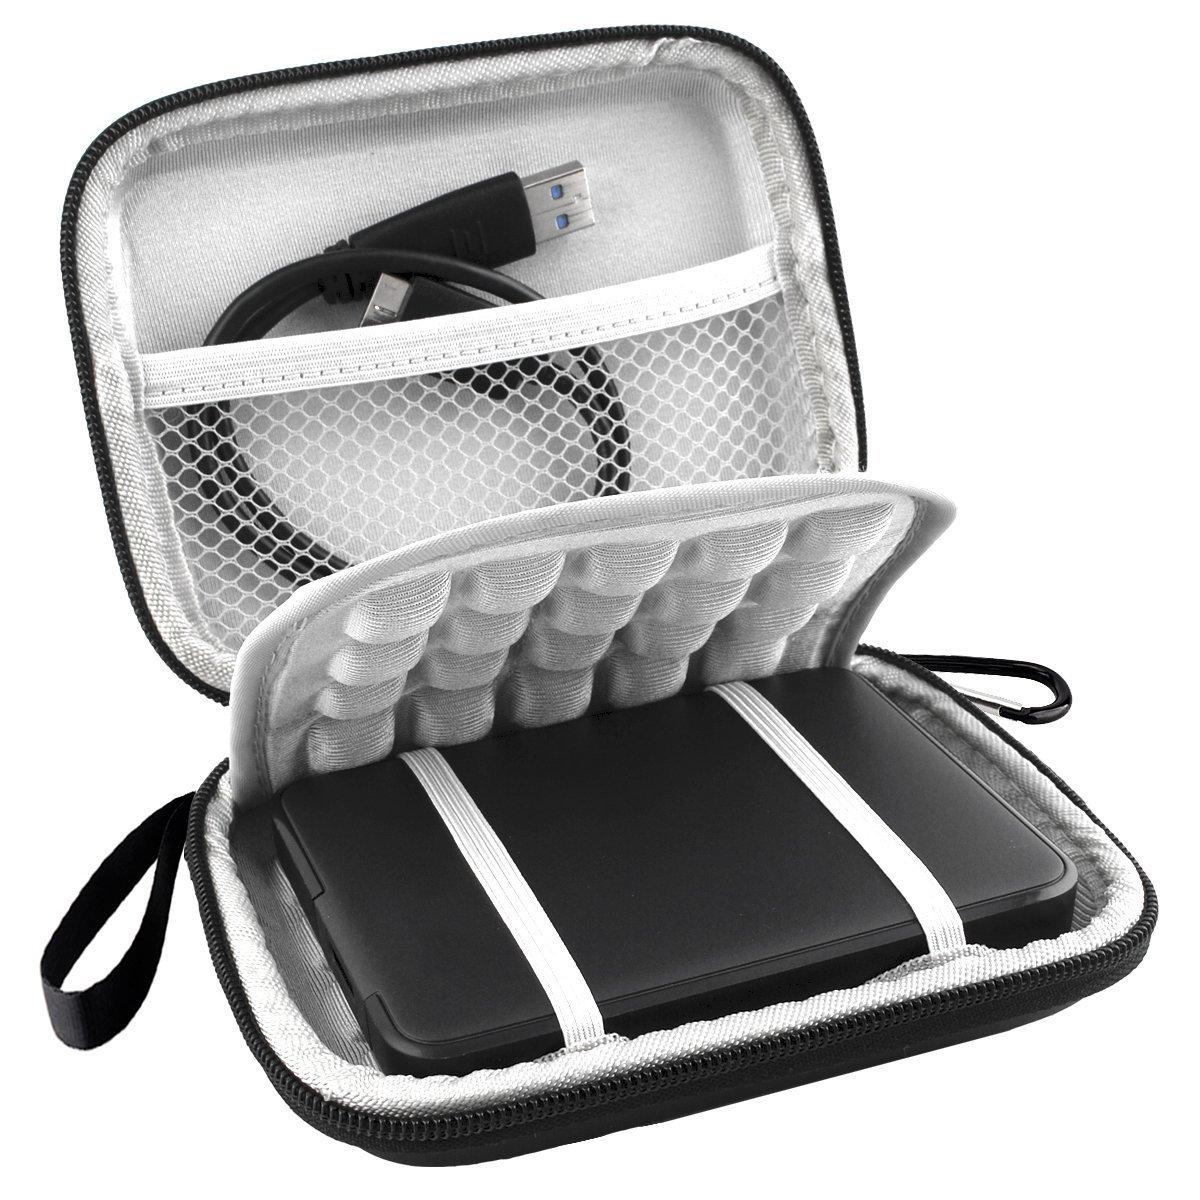 Lacdo EVA Shockproof Carrying Case for Western Digital My Passport Studio Ultra Slim Essential WD Elements SE Portable 500GB 1TB 2TB USB 3.0 Portable 2.5 inch External Hard Drive Travel Bag